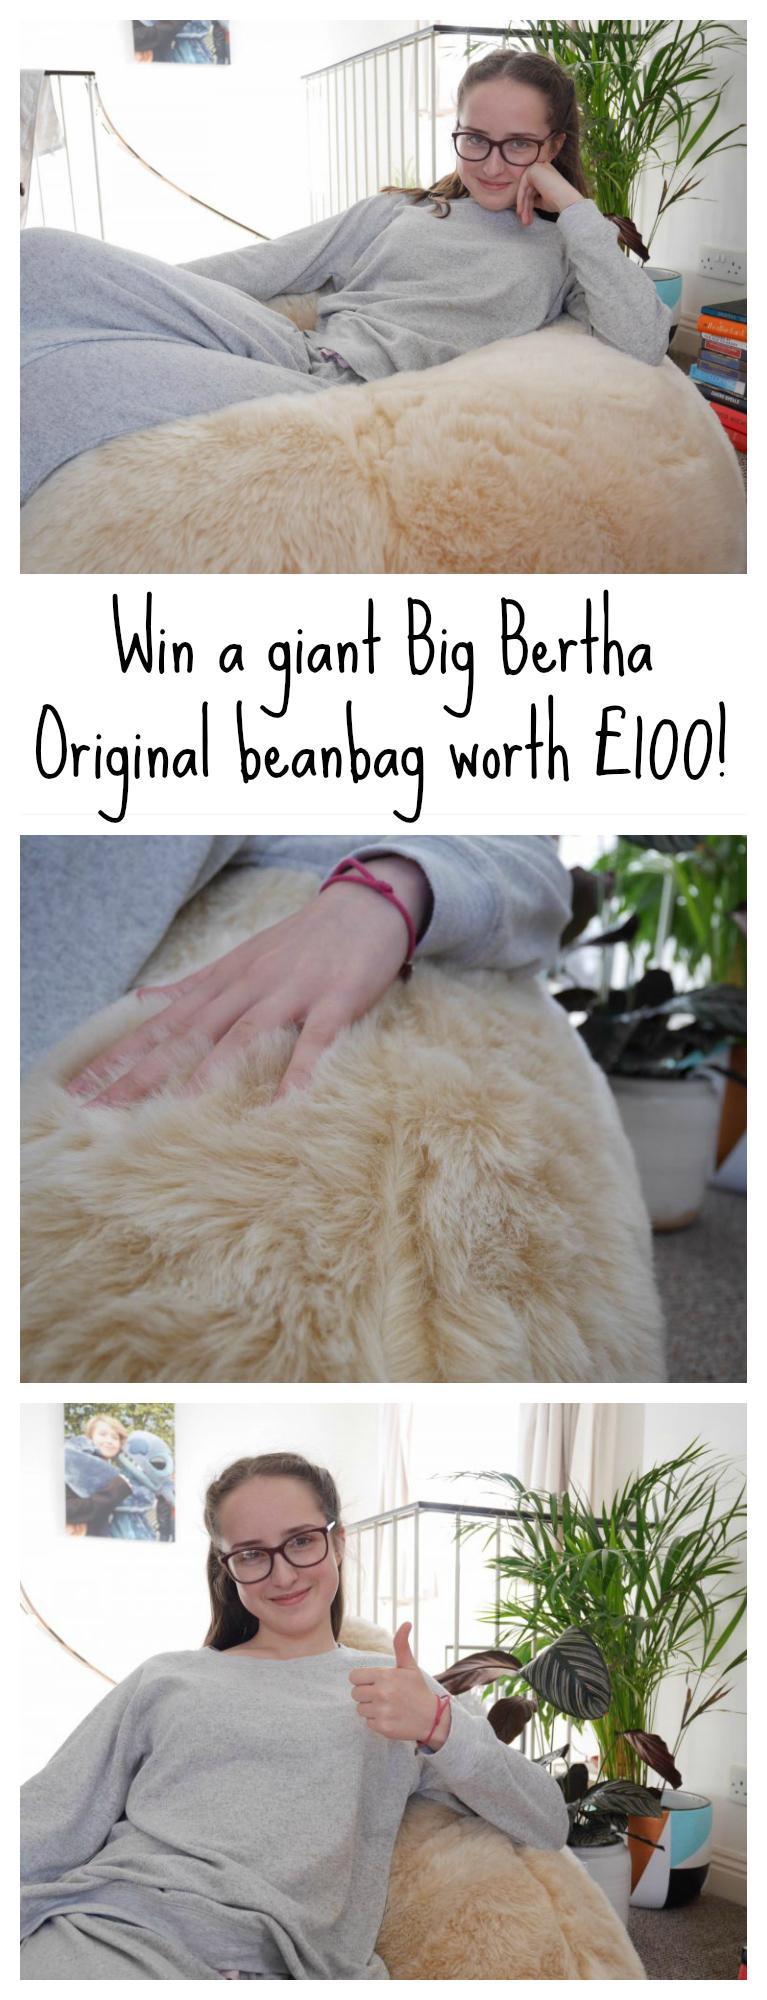 Big Bertha Original giant beanbag